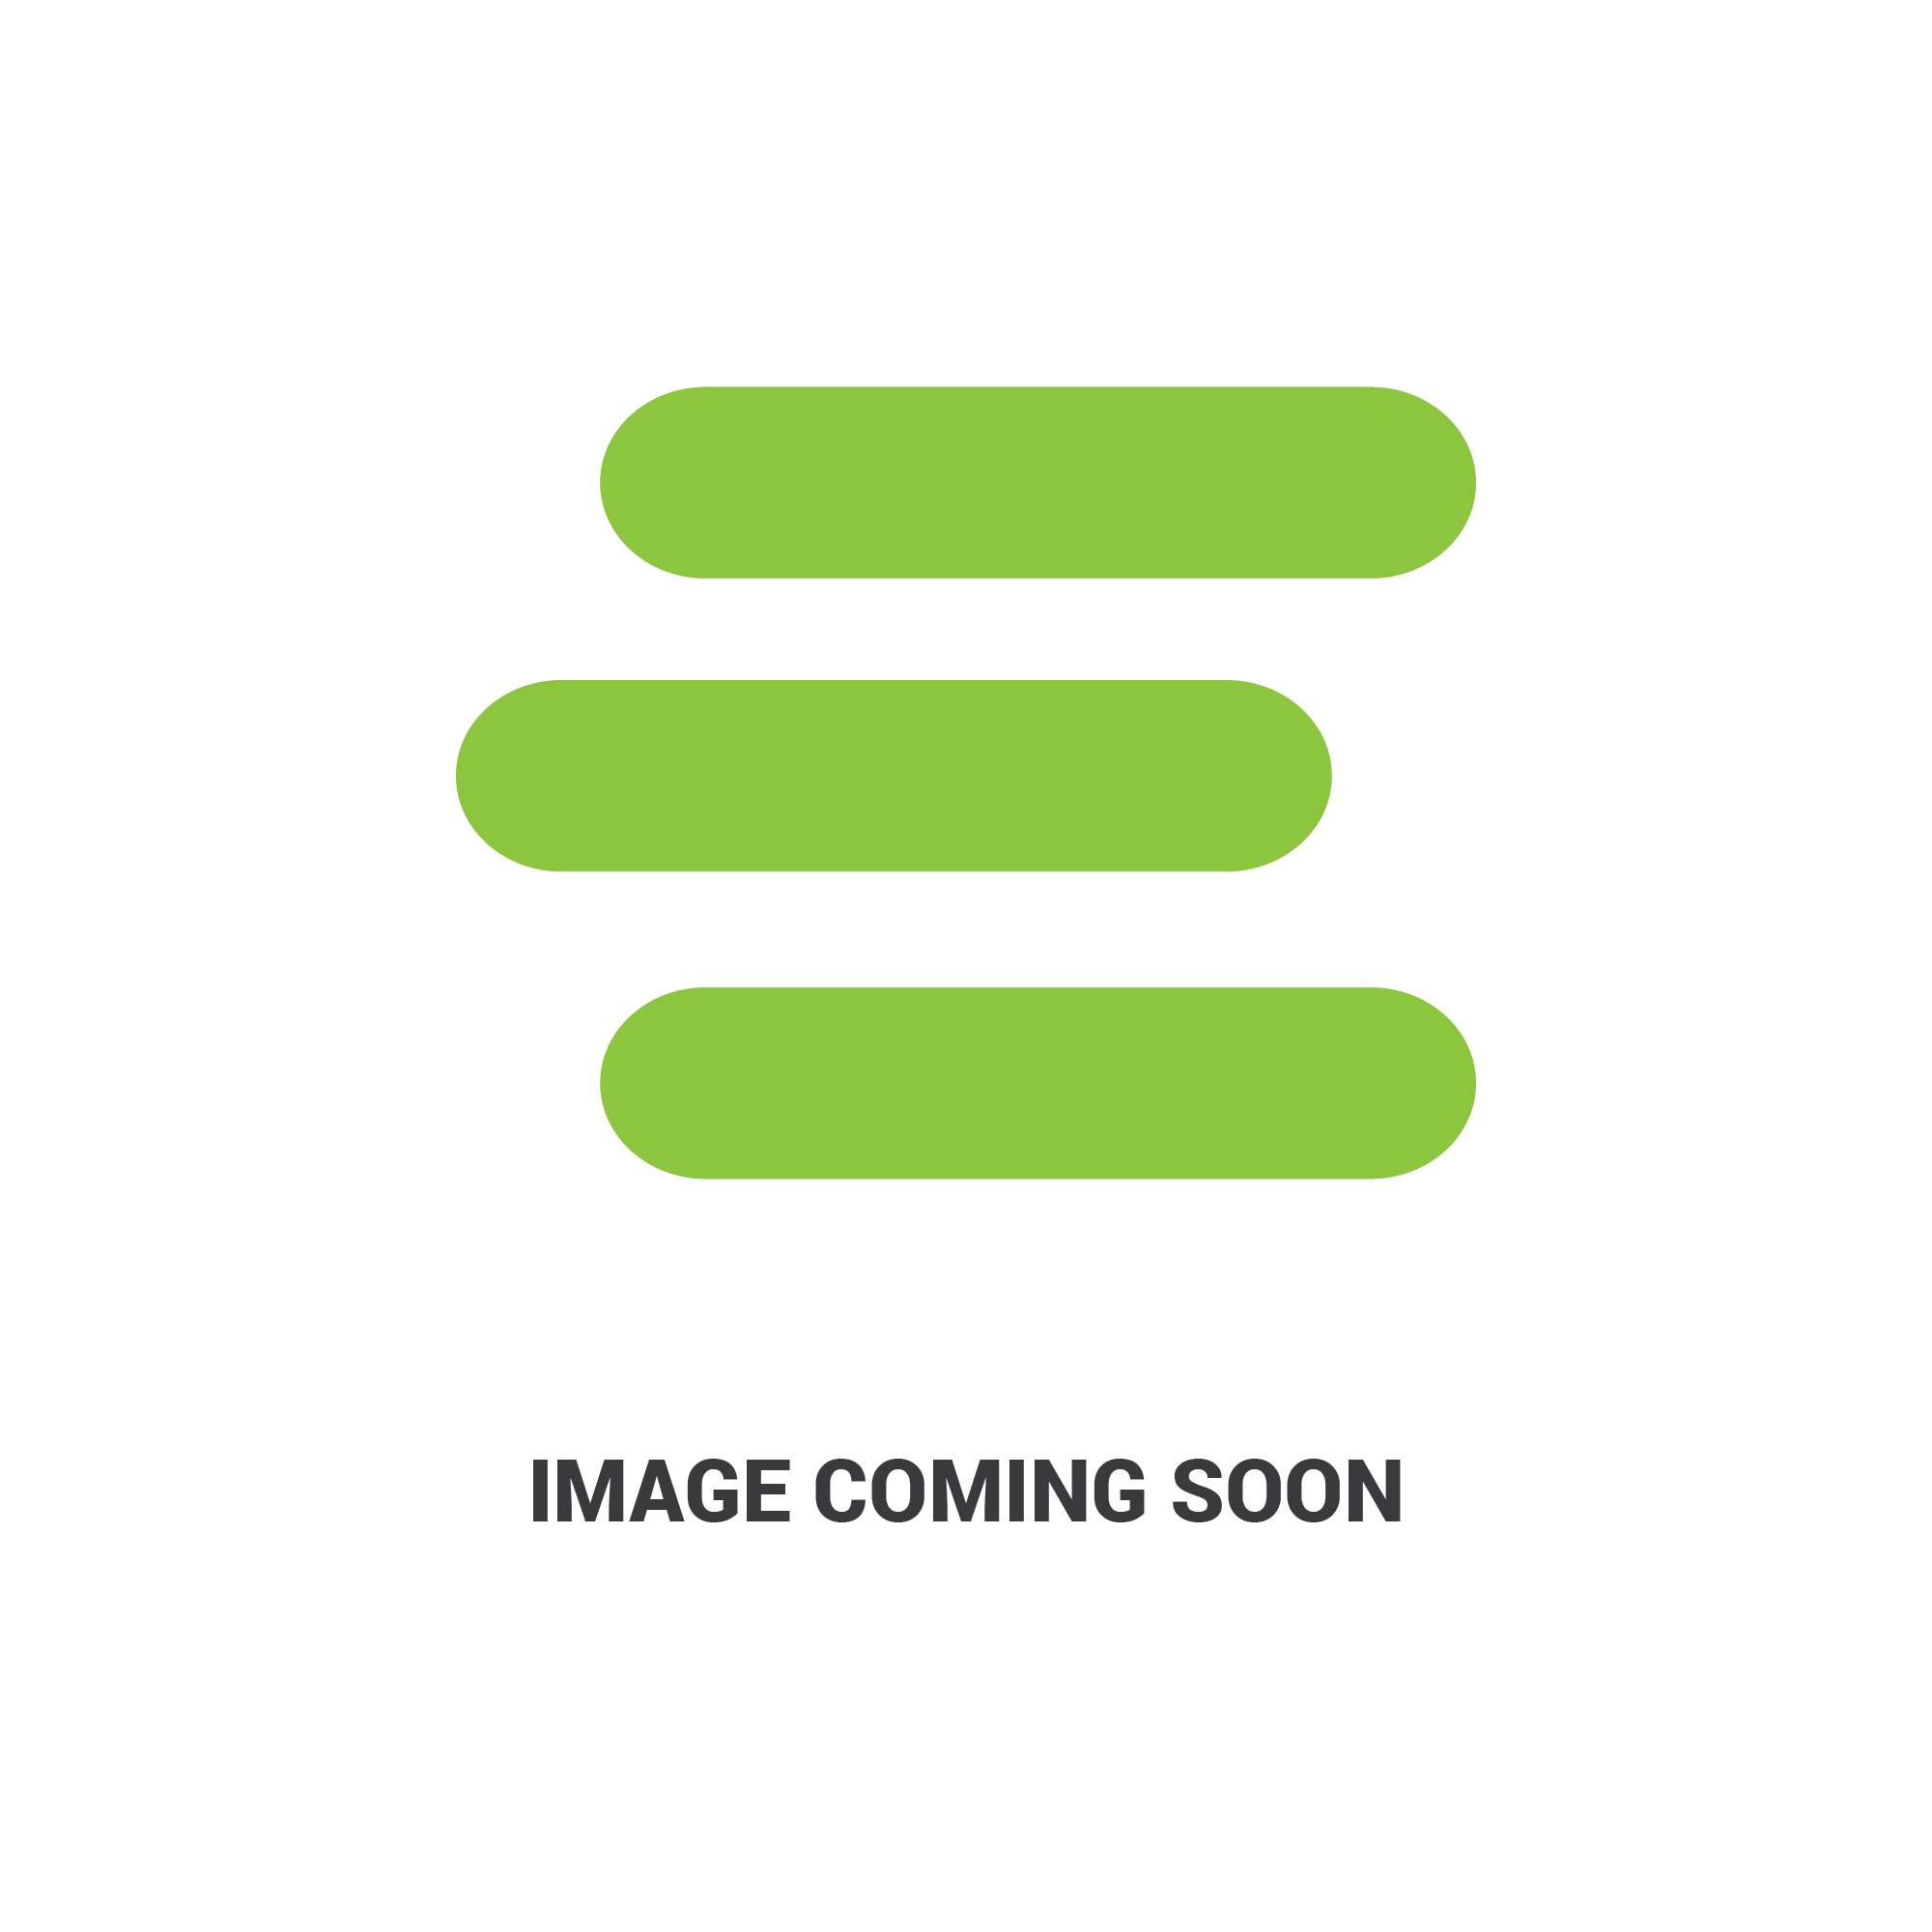 E-3C001-630721344_1.jpg